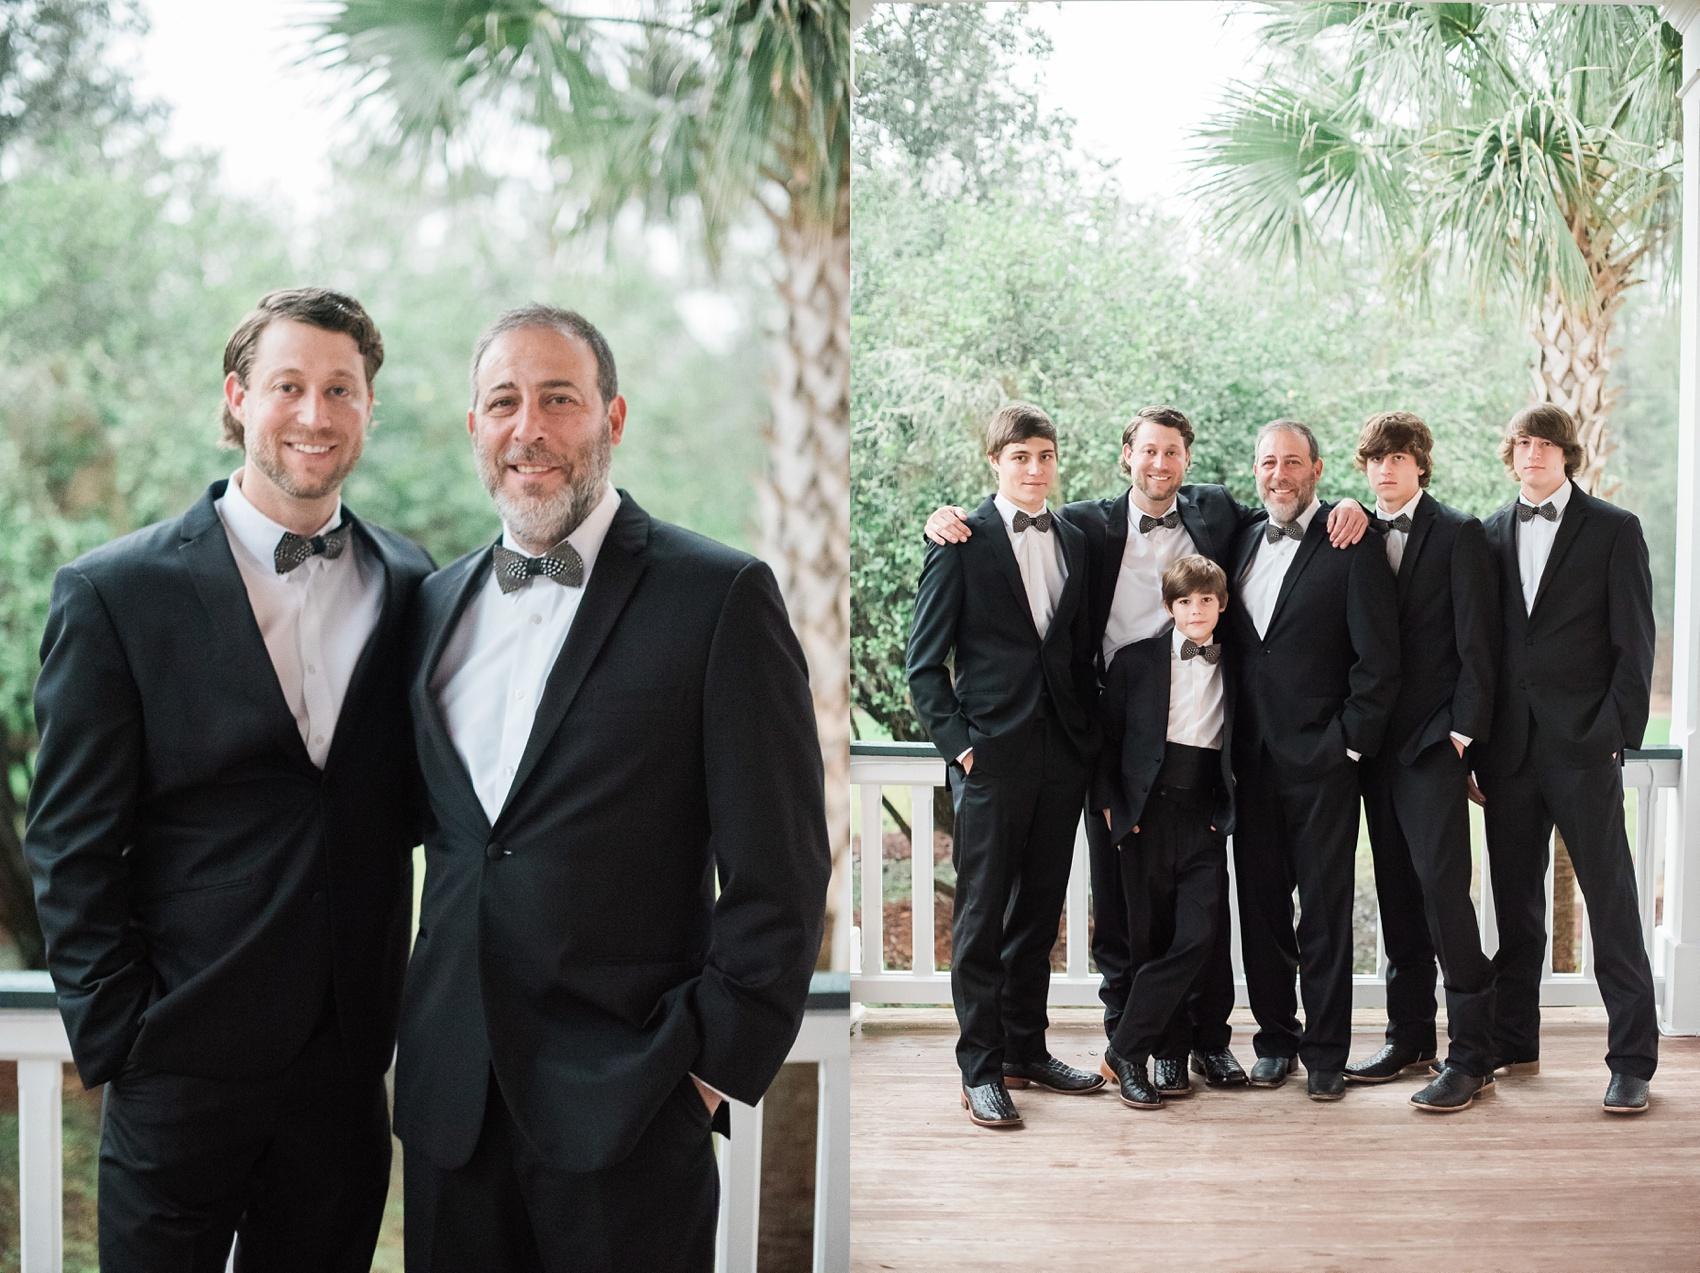 South_carolina_wedding_photographer_0064.jpg